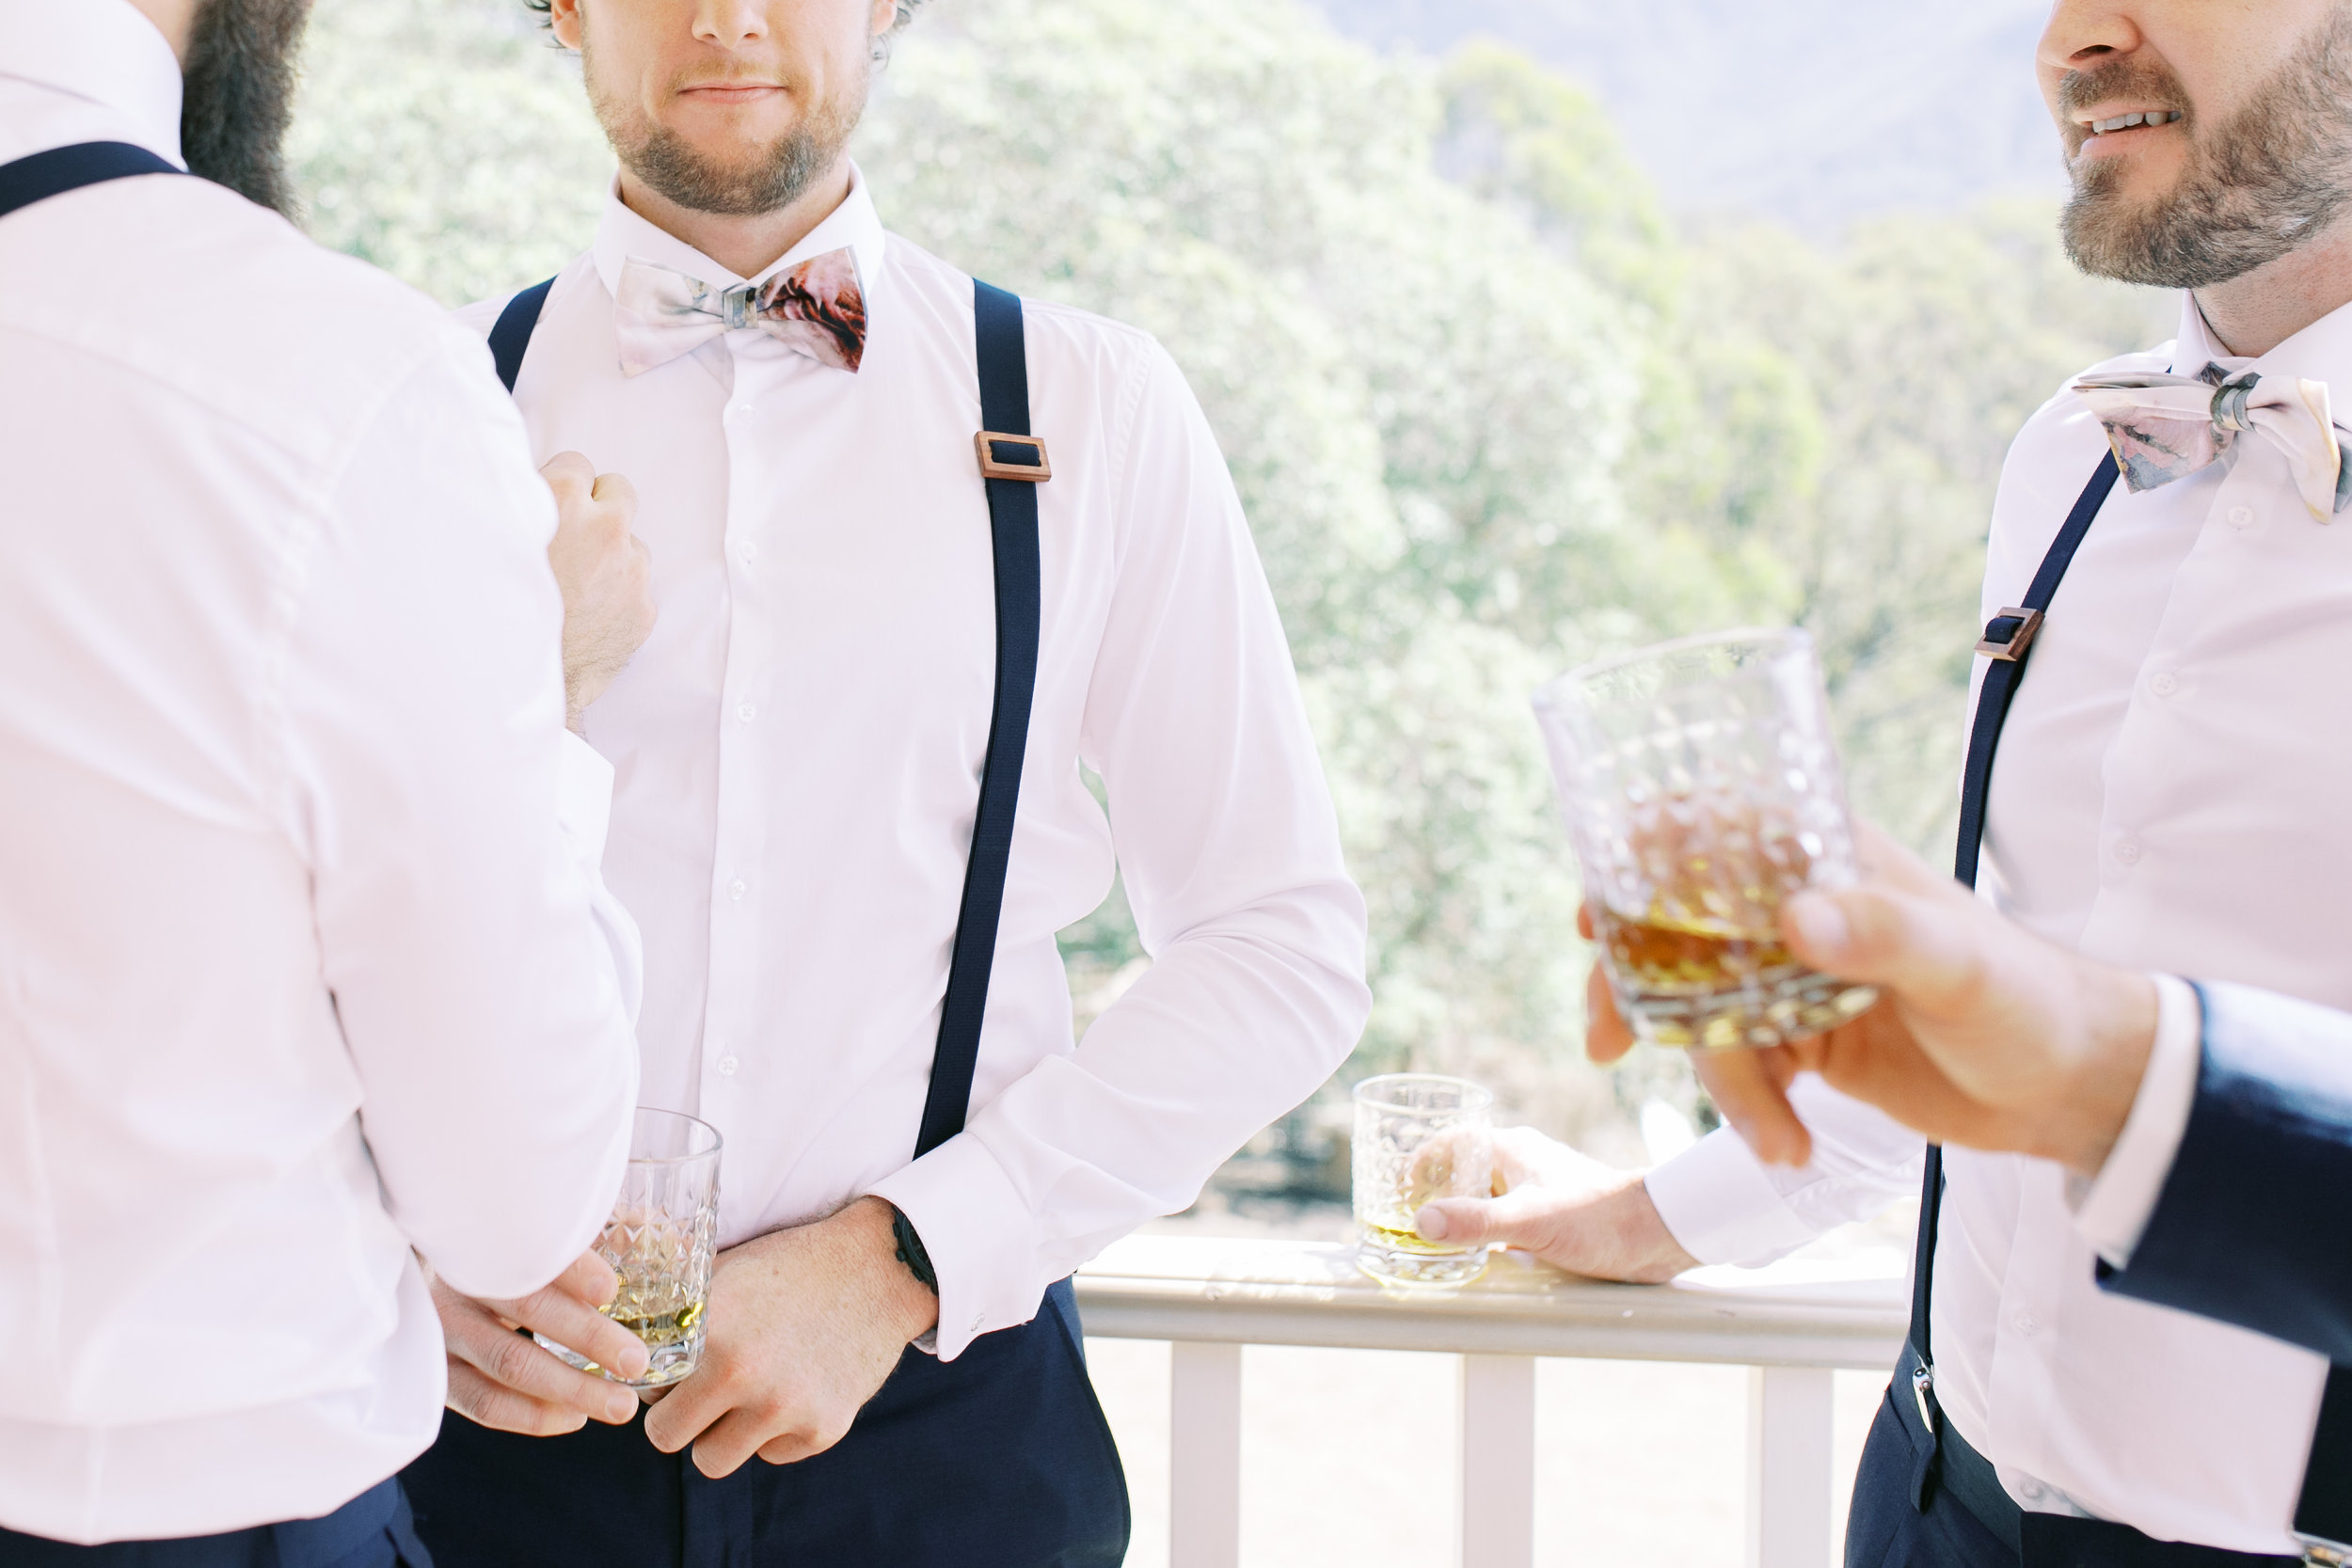 Kooroomba-Vineyard-Lavender-Farm-Wedding-Fine-Art-Lauren-Olivia-30.jpg